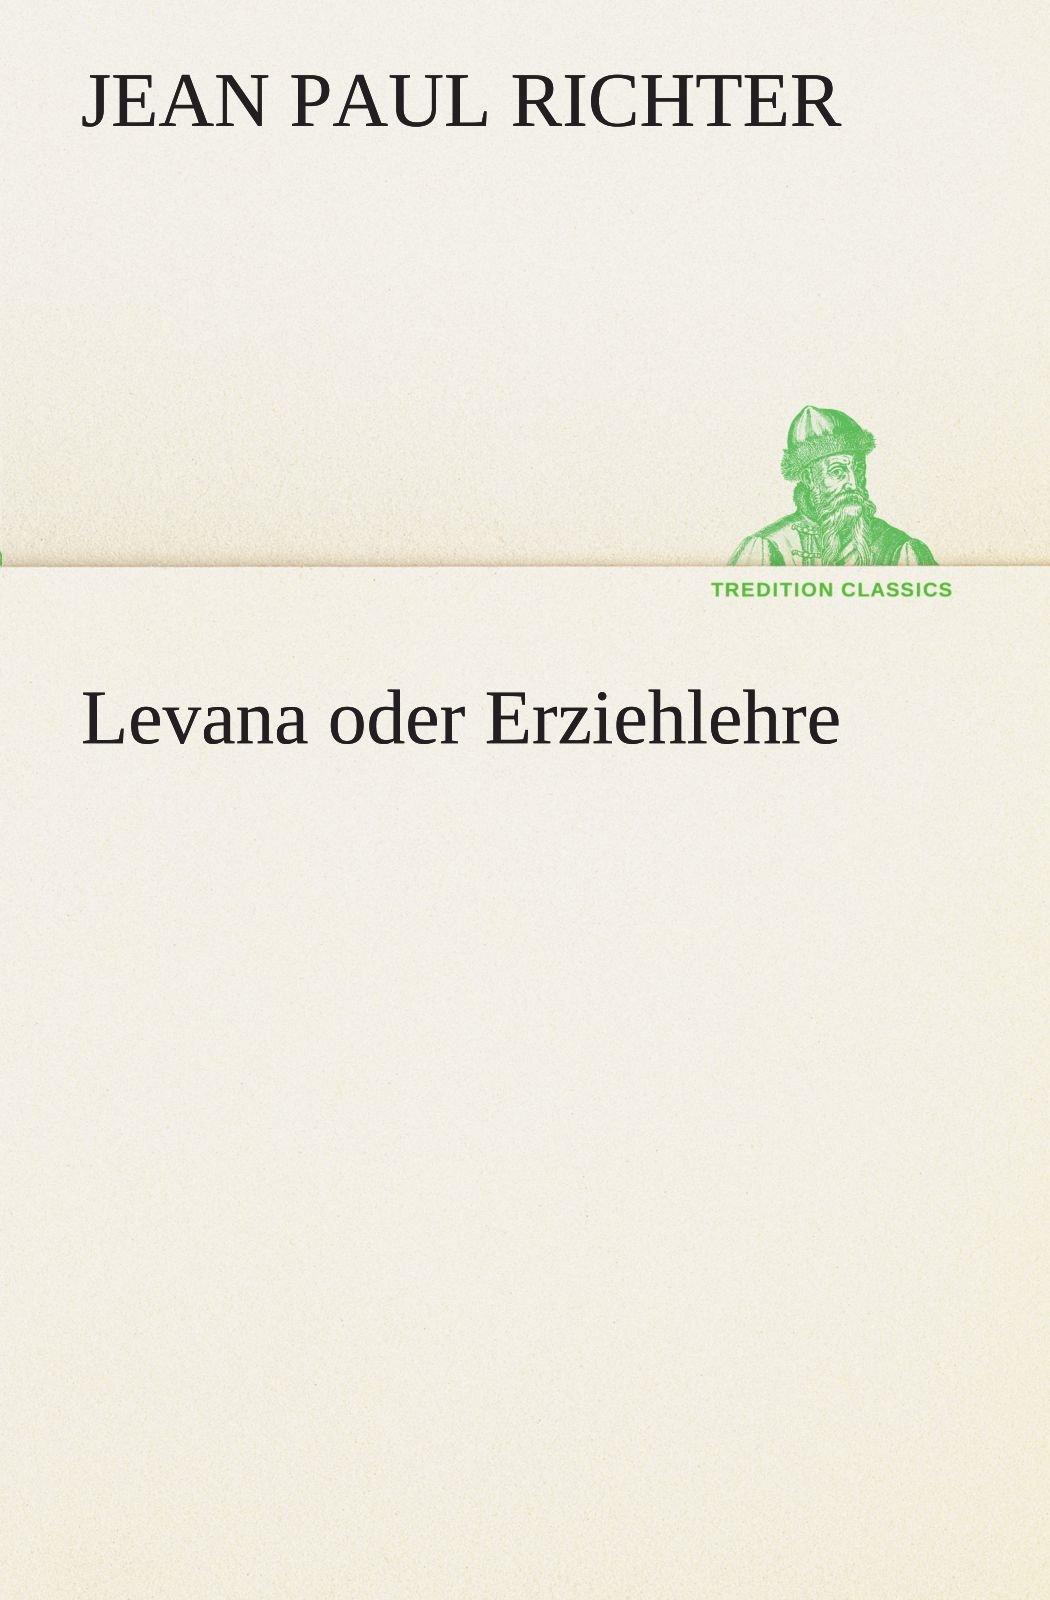 Download Levana oder Erziehlehre (TREDITION CLASSICS) (German Edition) ebook